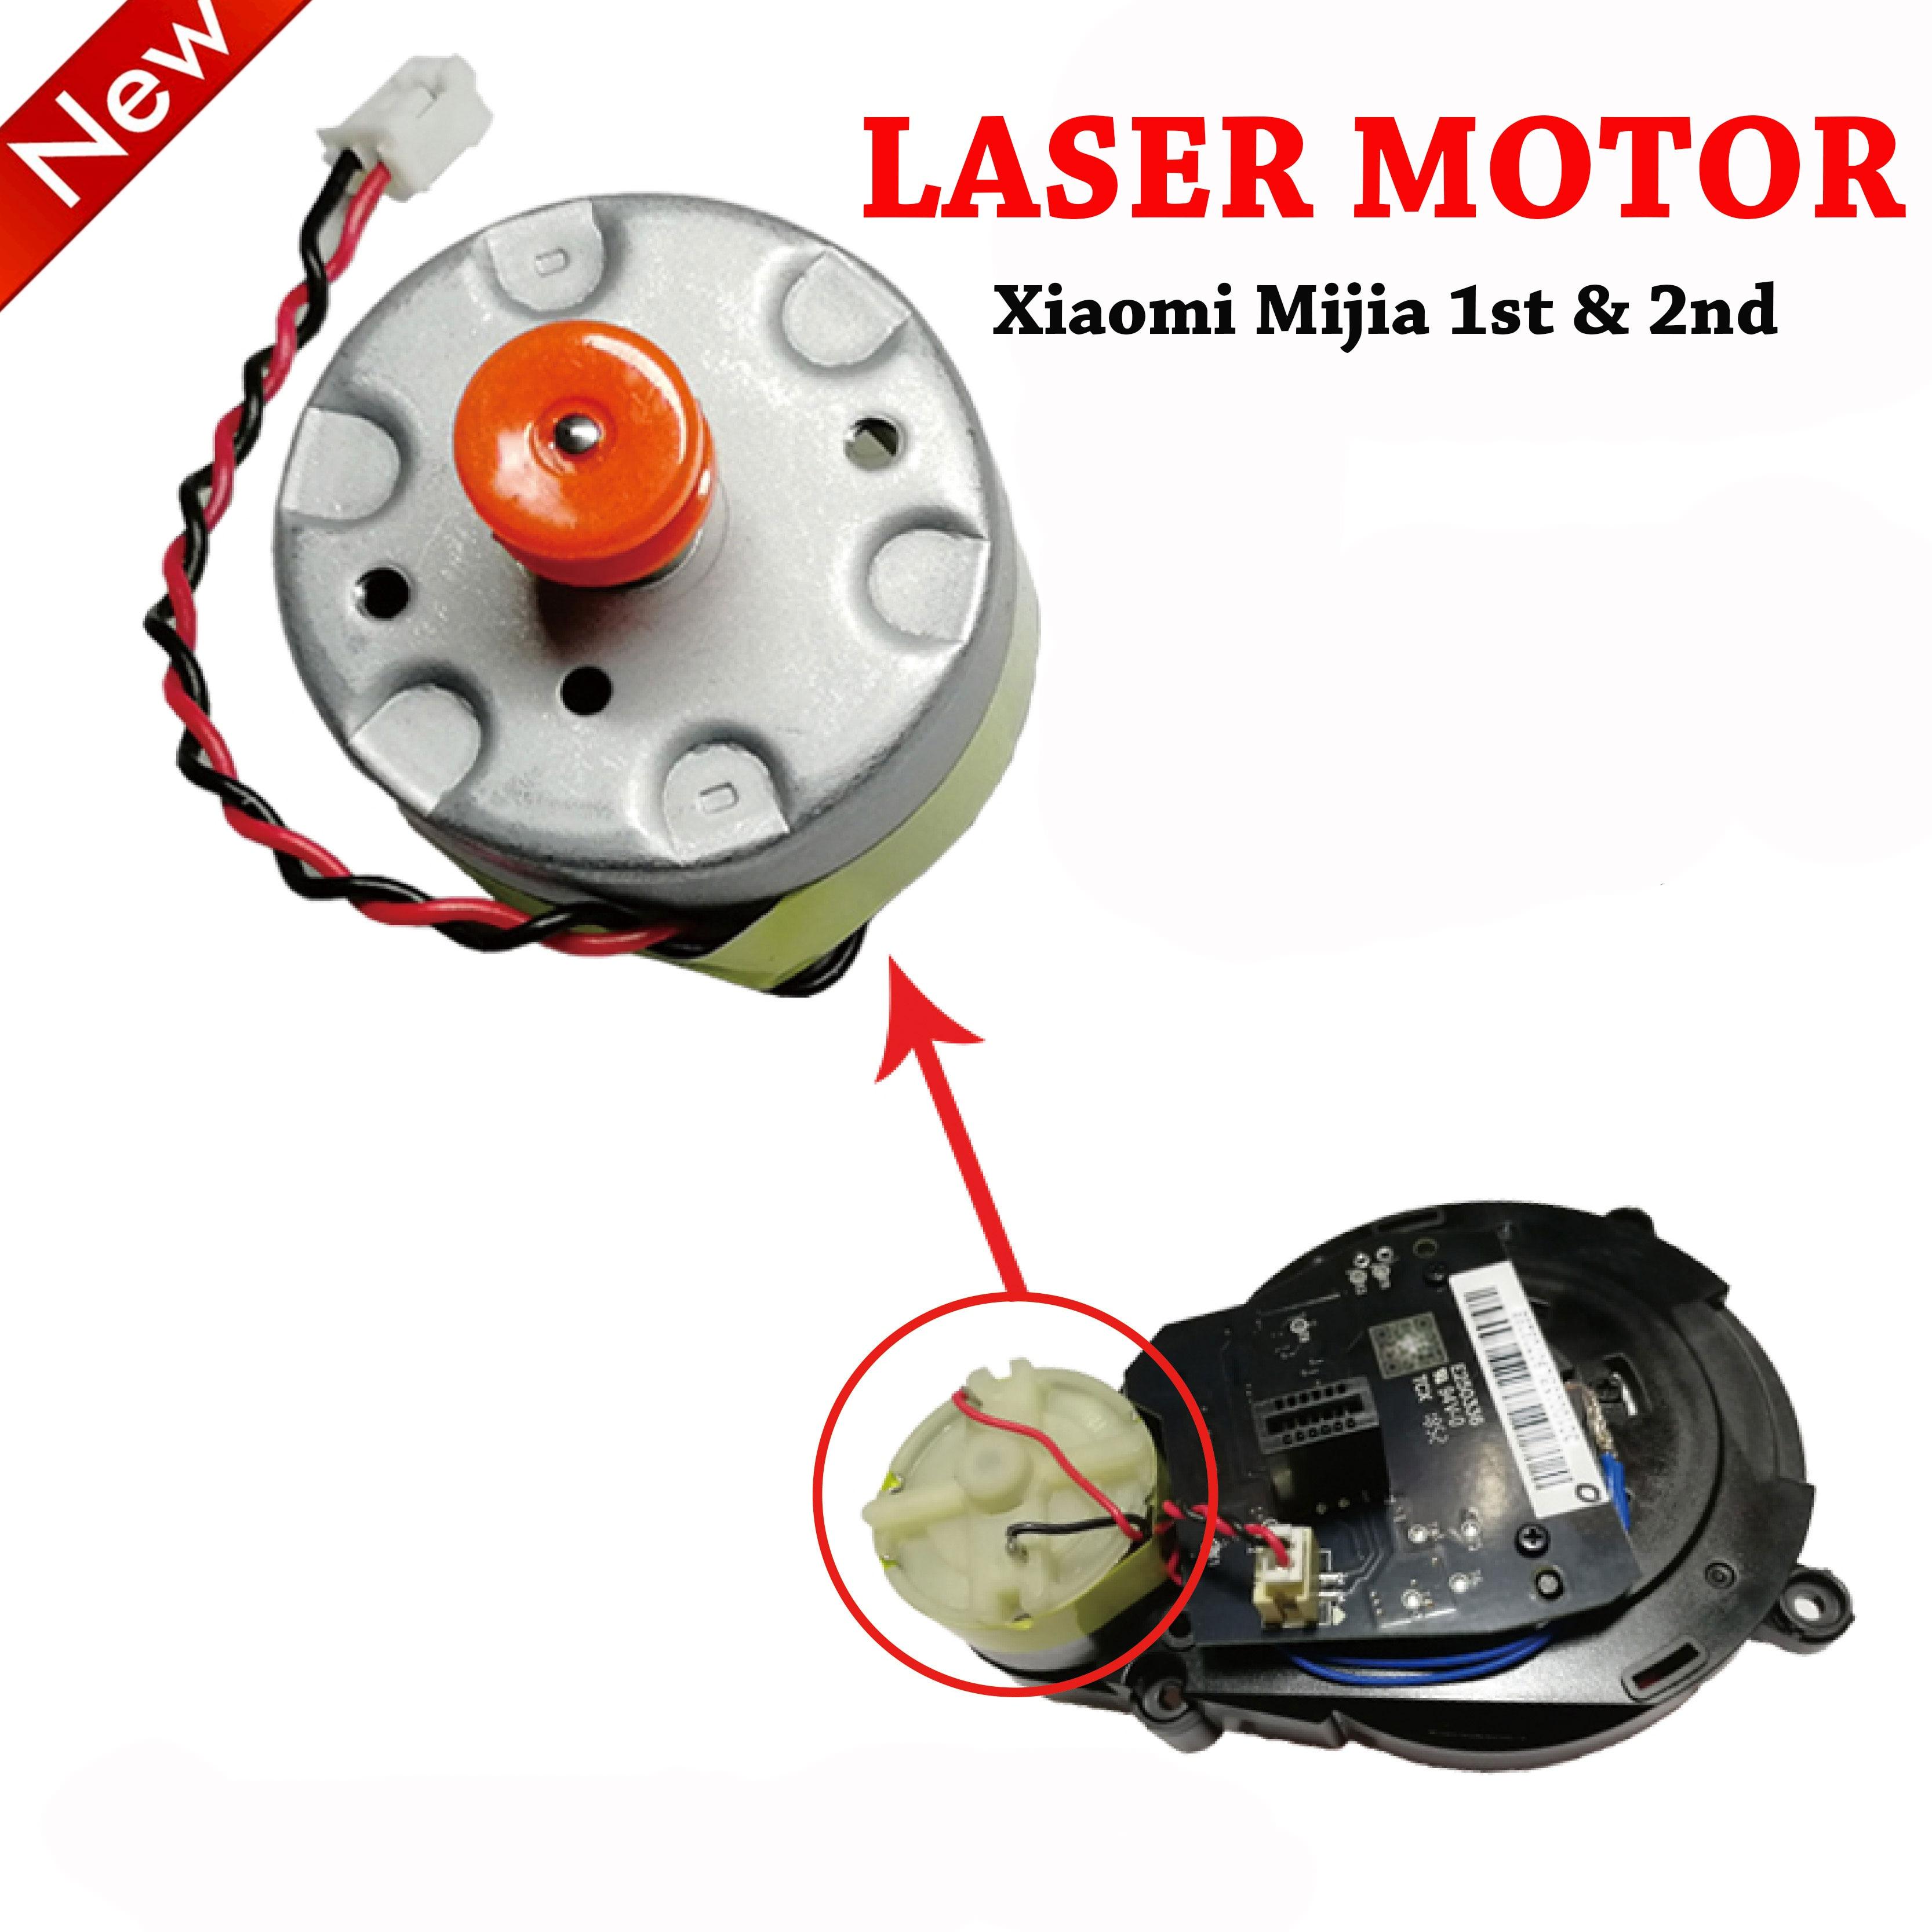 Gear Transmission Motor For Xiaomi Mijia 1st 2nd & Roborock S50 S51 S55 Robot Vacuum Cleaner Laser Sensor LDS Cleaner Motor